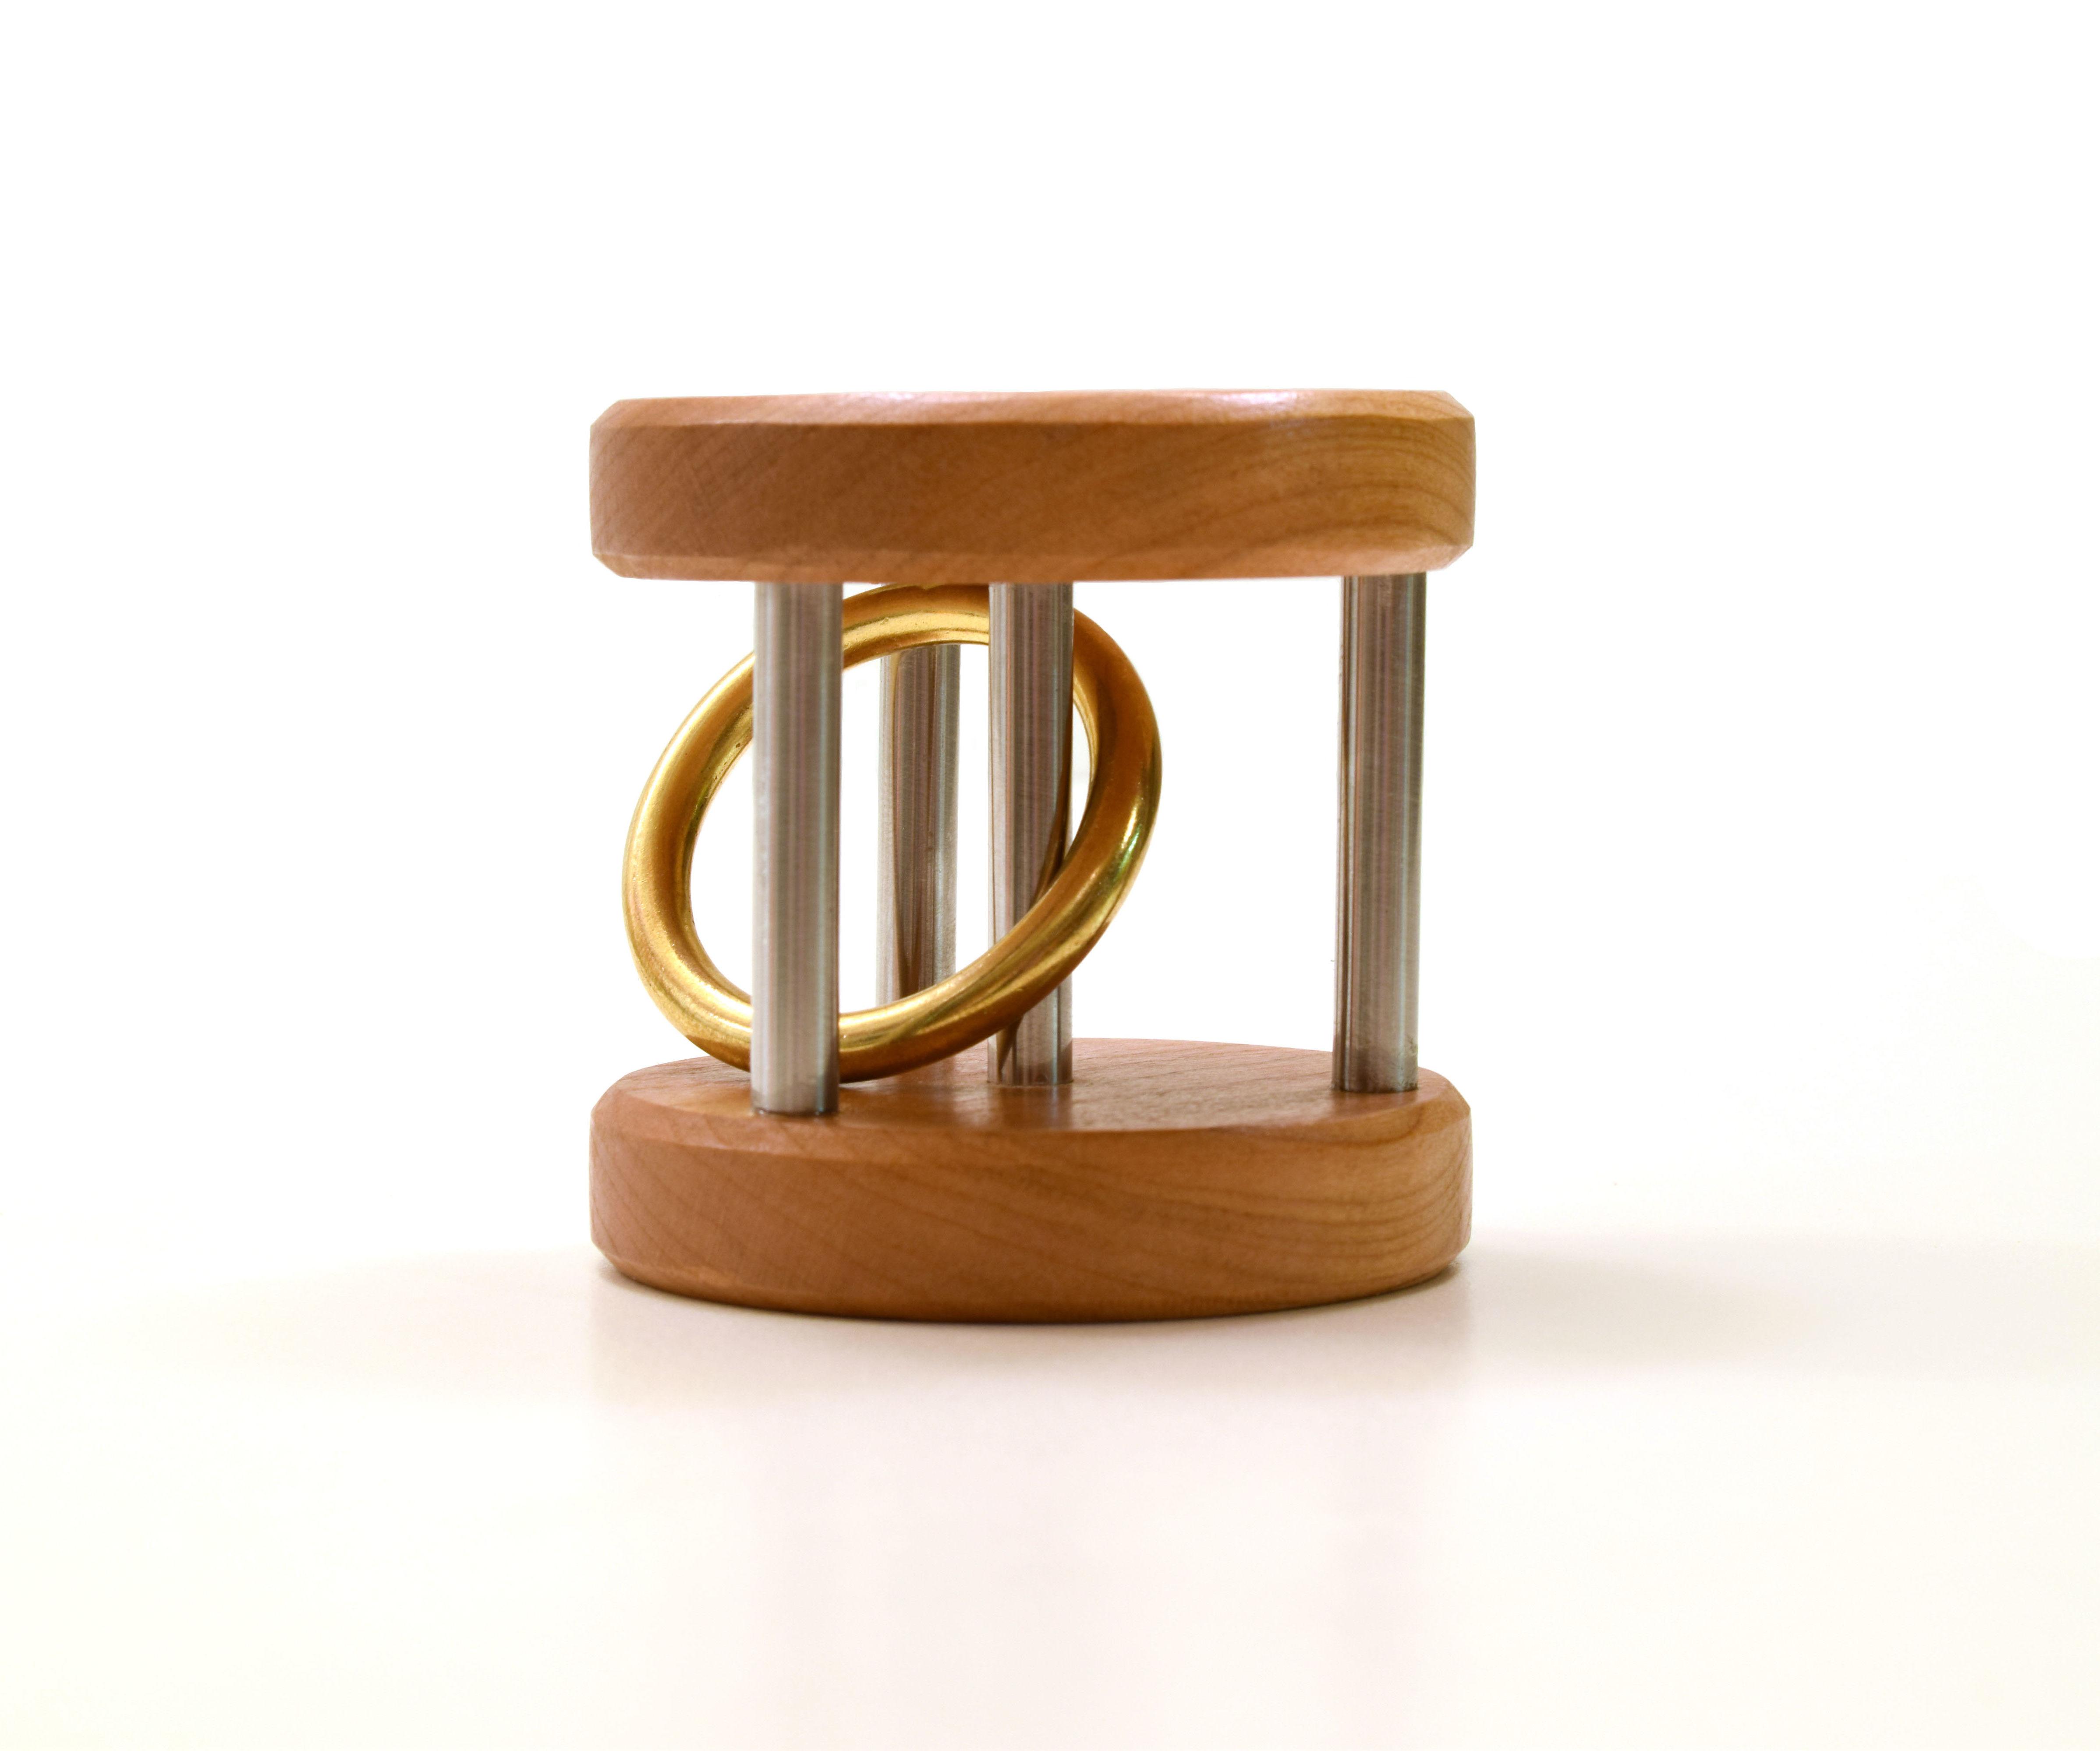 Captive Ring Puzzle